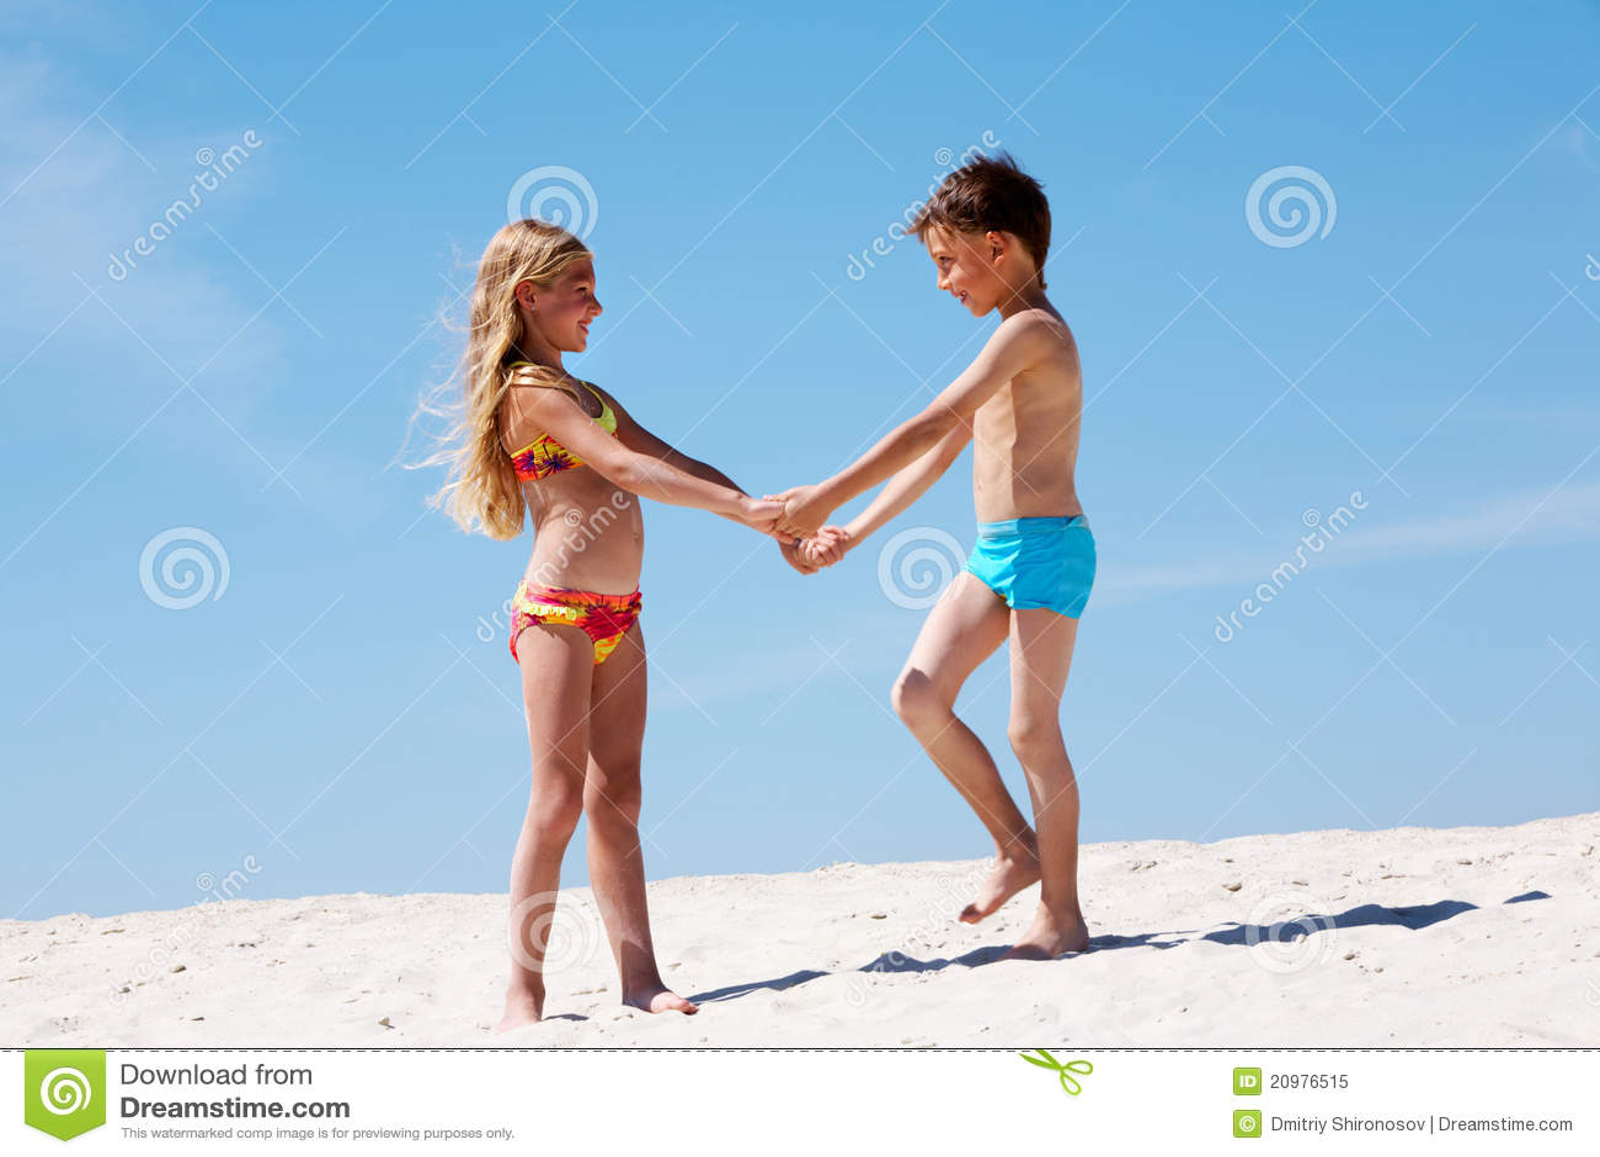 Jonge geitjes op zand